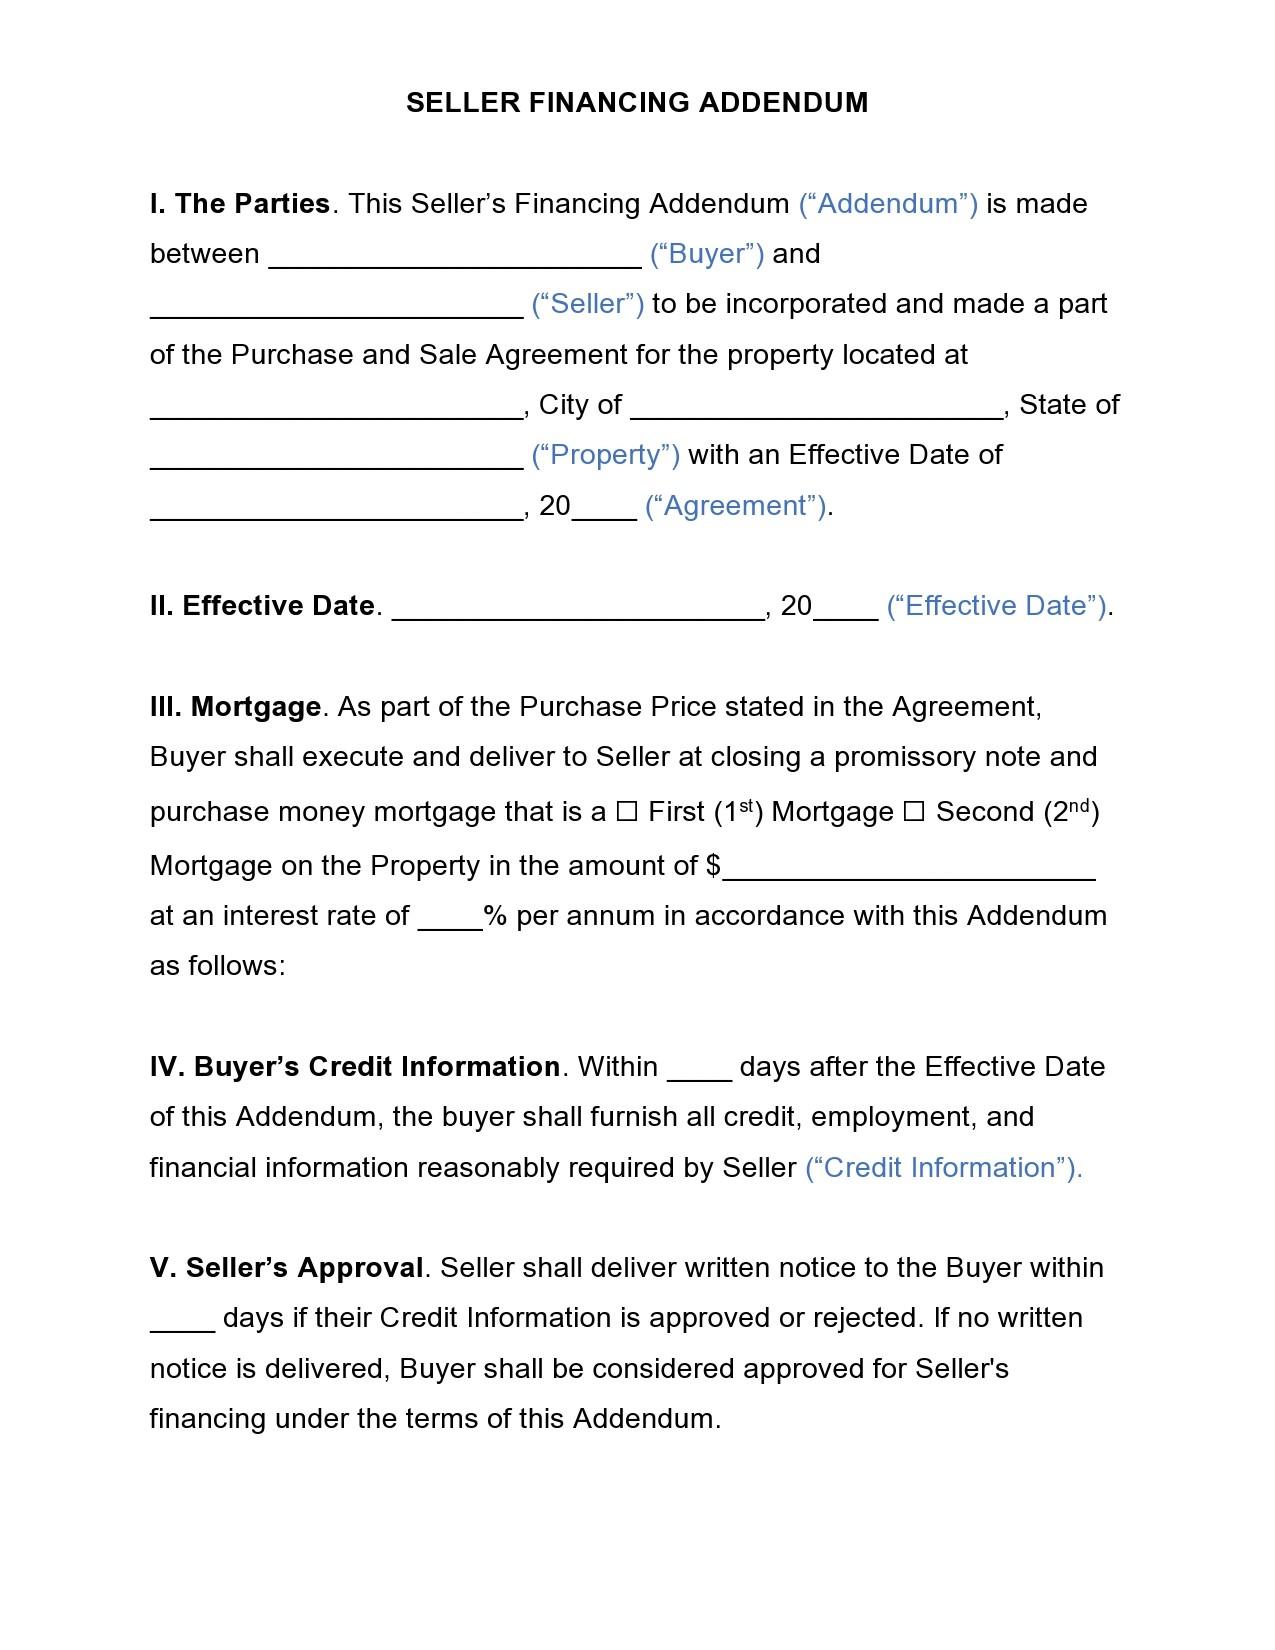 Free seller financing addendum 13